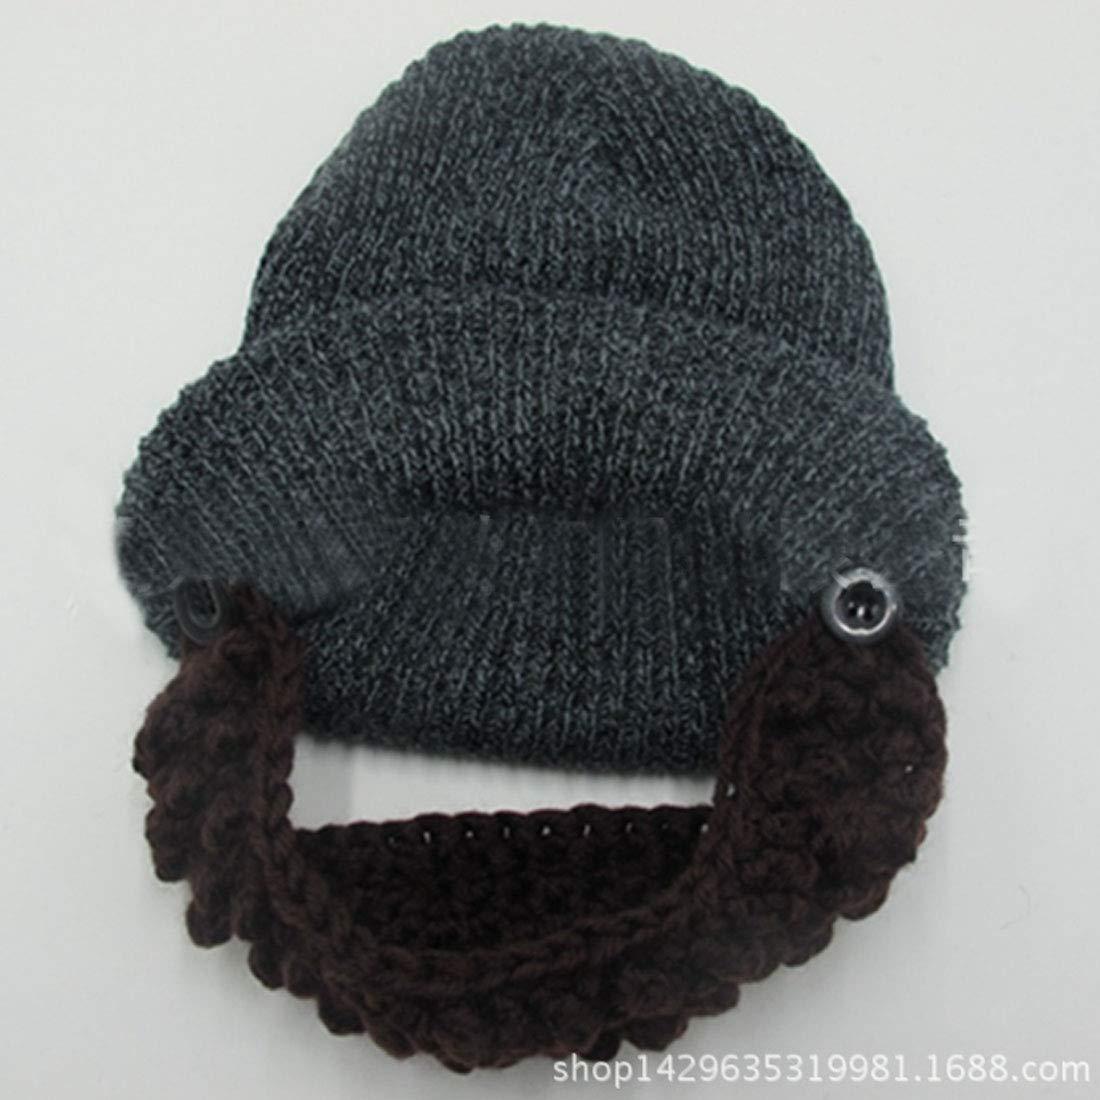 ae1a42d6ed3c Lerben Men Women Beard Hats Warm Winter Knitted Beanie Caps Ski Hat Black  at Amazon Men's Clothing store